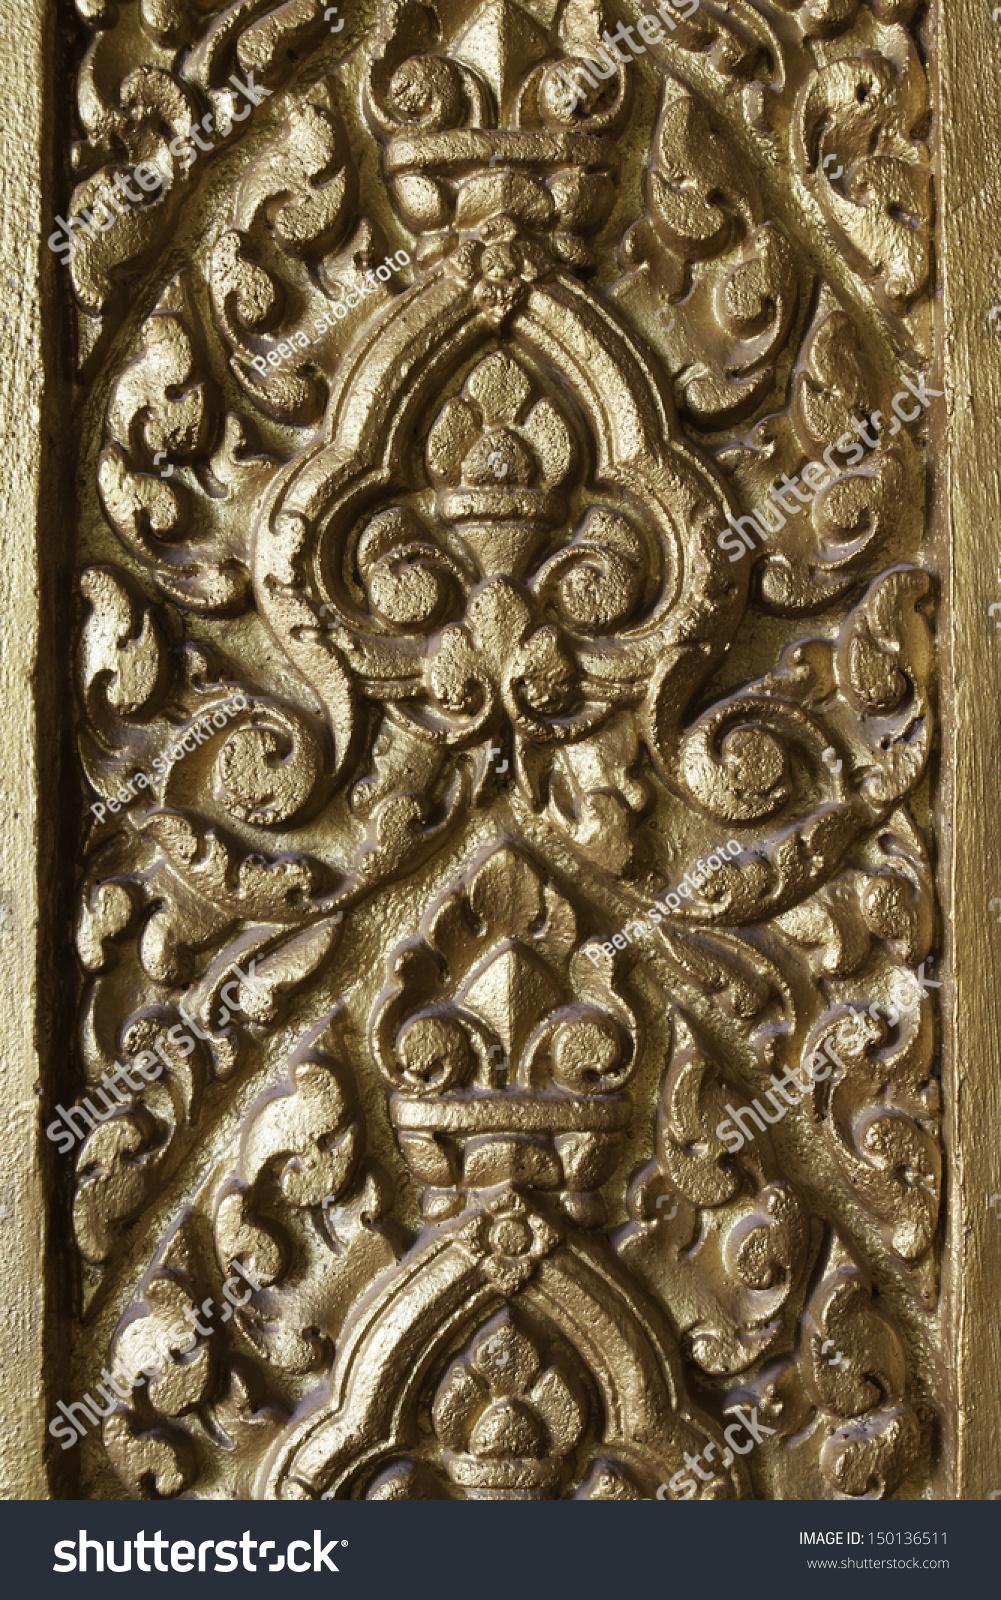 Royalty free handmade carvings of cambodia patternu